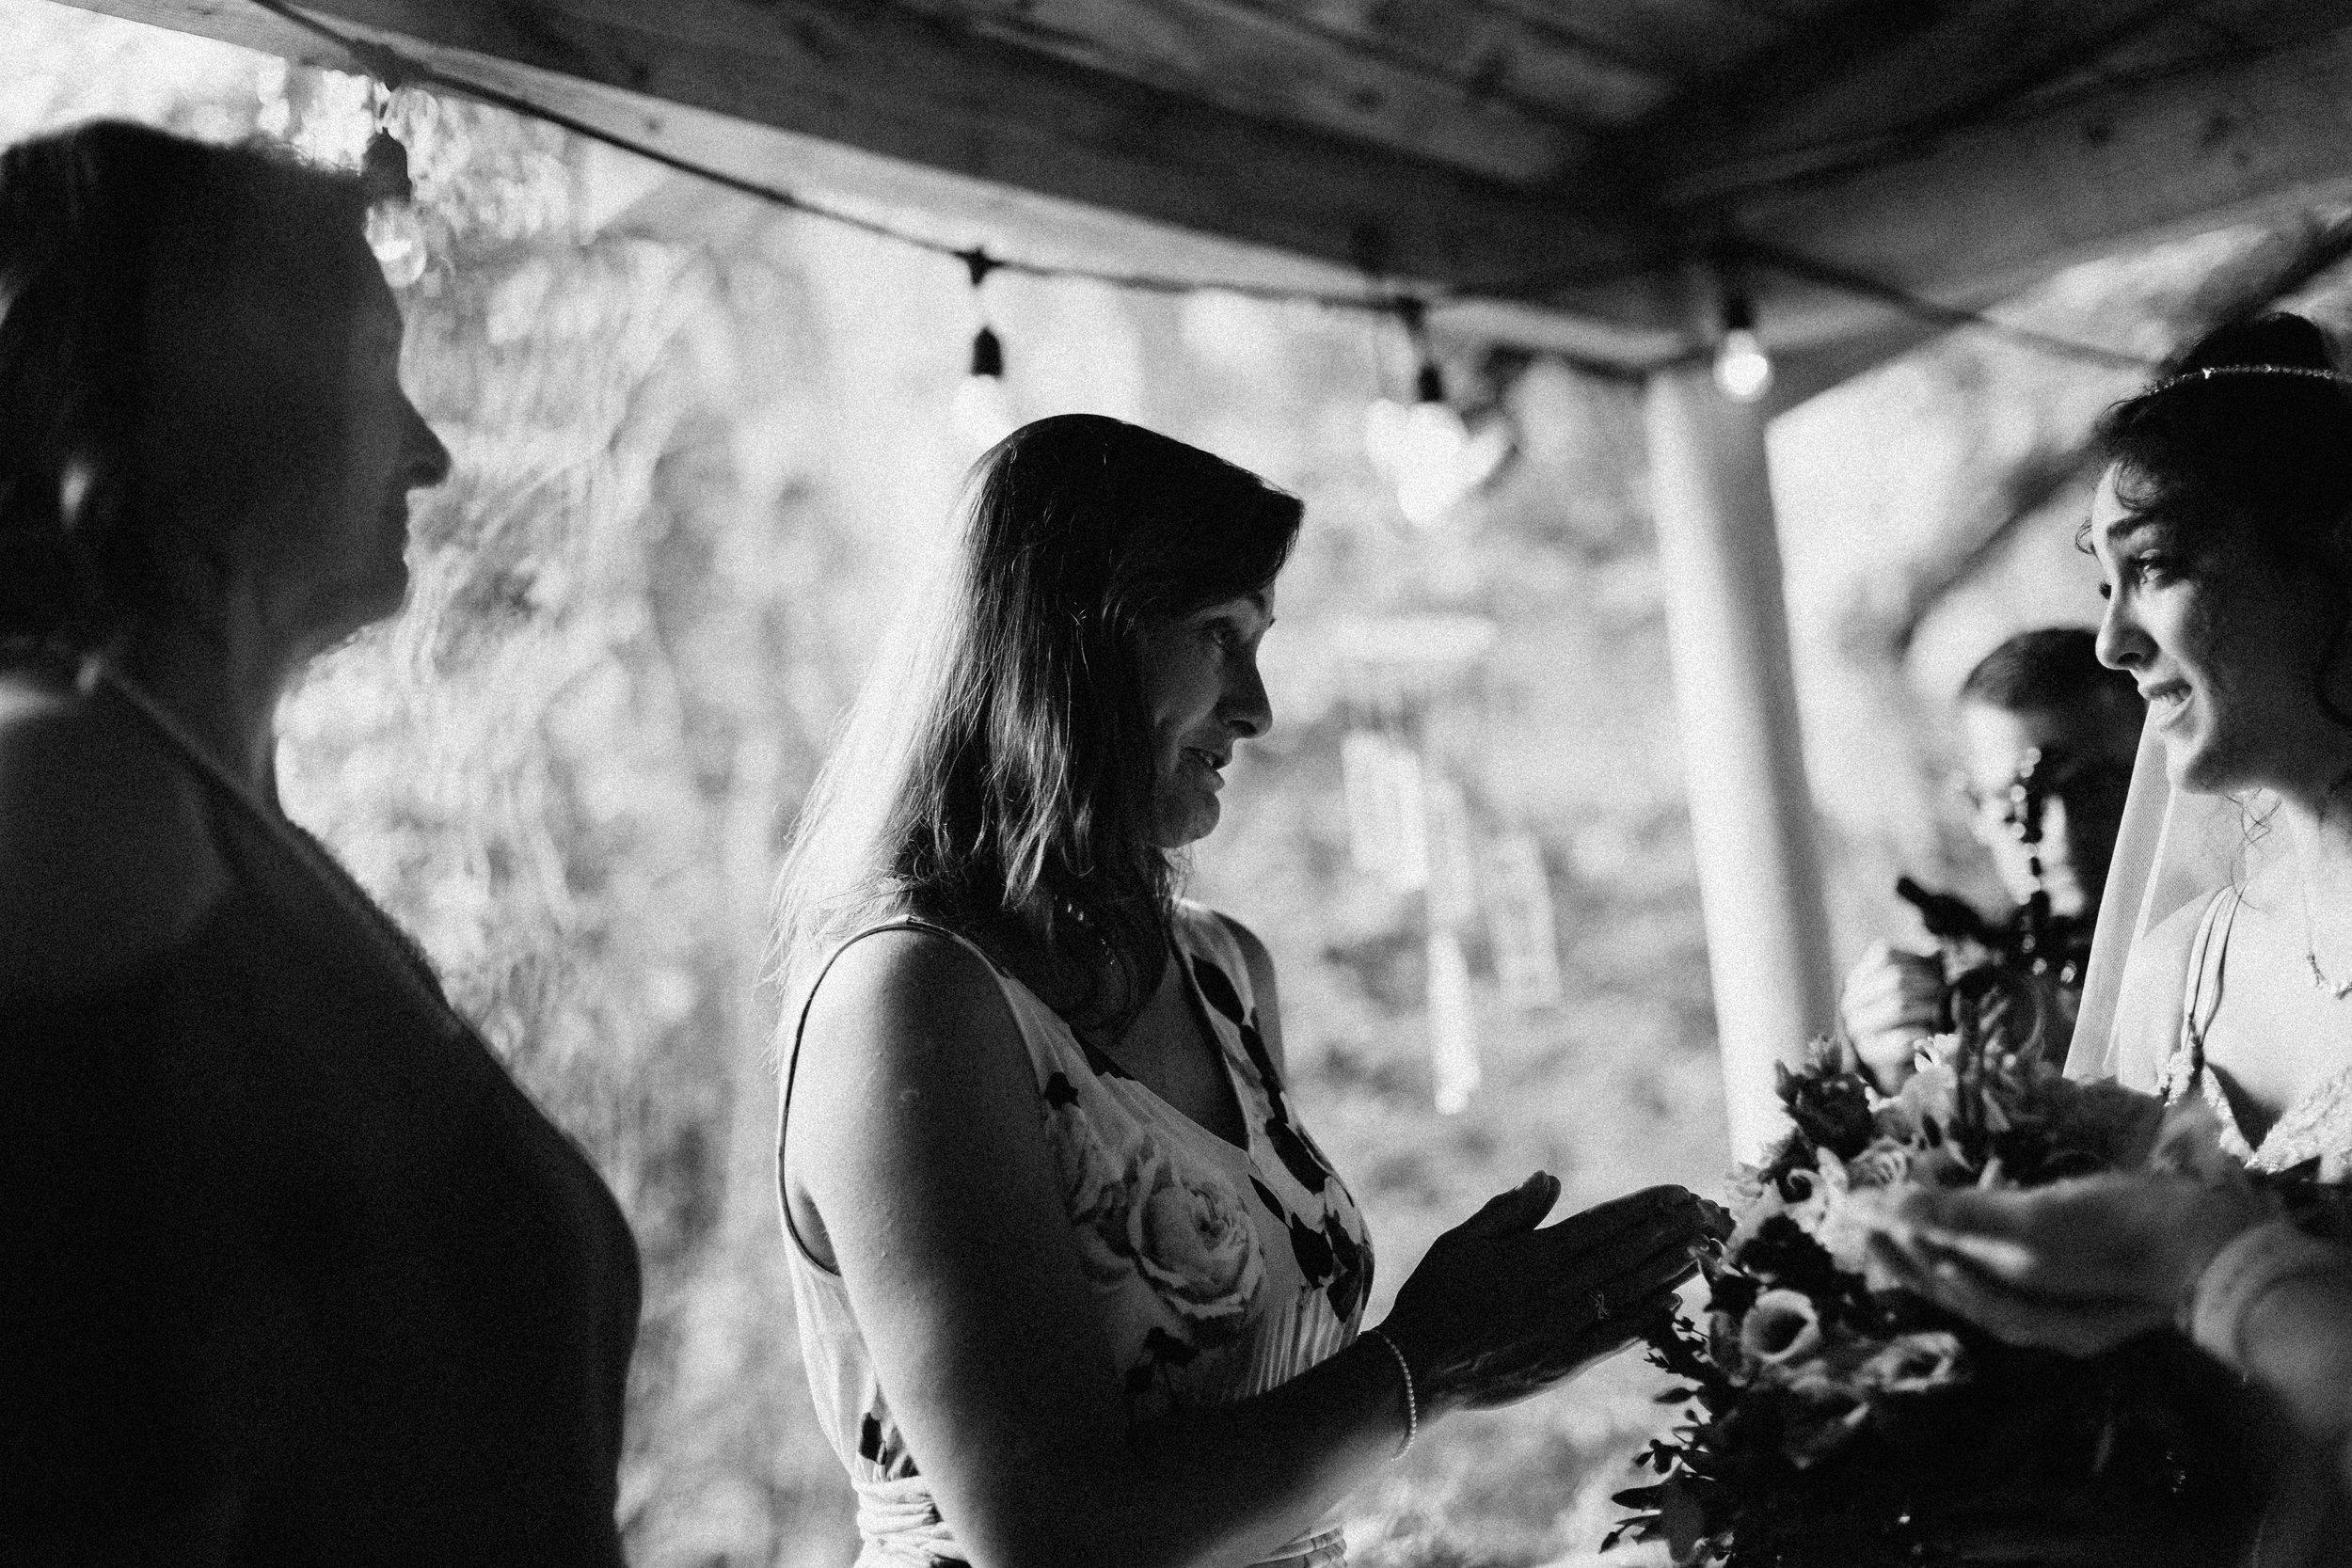 neverland_farms_atlanta_wedding_photographer_documentary_river_west_1345.jpg